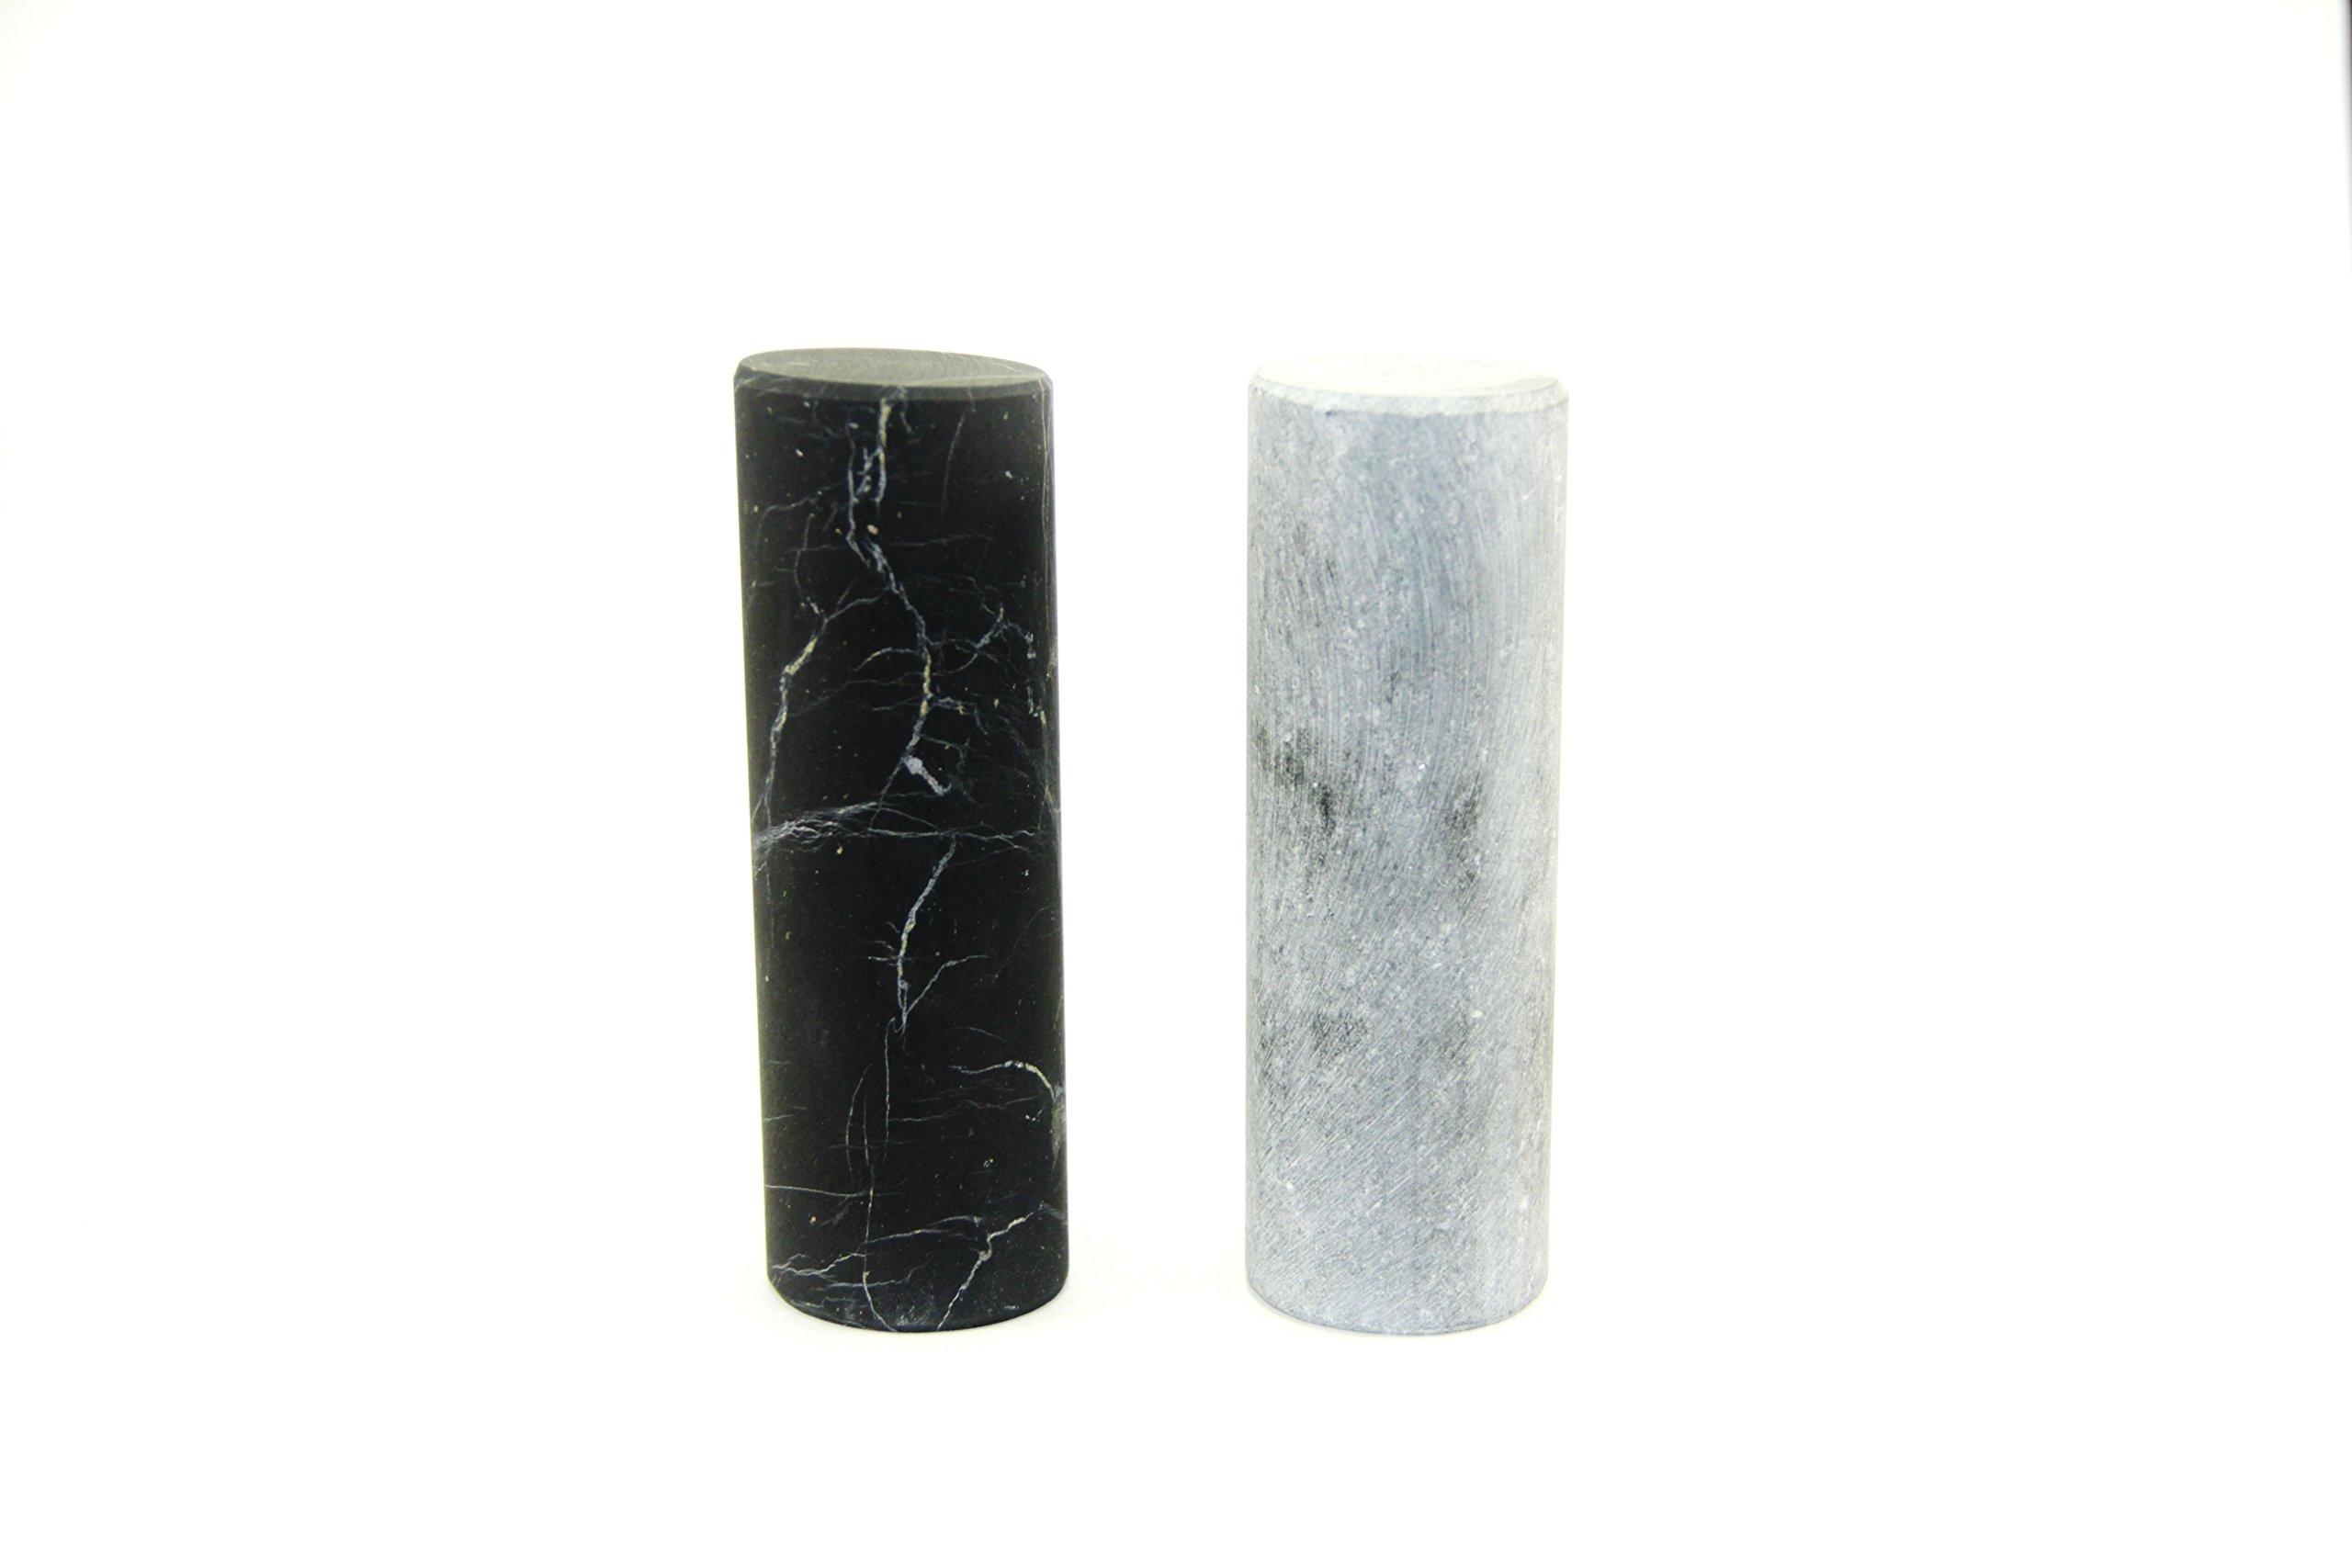 Unpolished Shungite Crystal Pharaoh Cylinders - 100% natural unpolished gemstone - Russia Stone - Gem - Semi precious Mineral - Reiki, Meditation, Crystal Healing - Alien Stone by Crystal Dreams (Image #3)